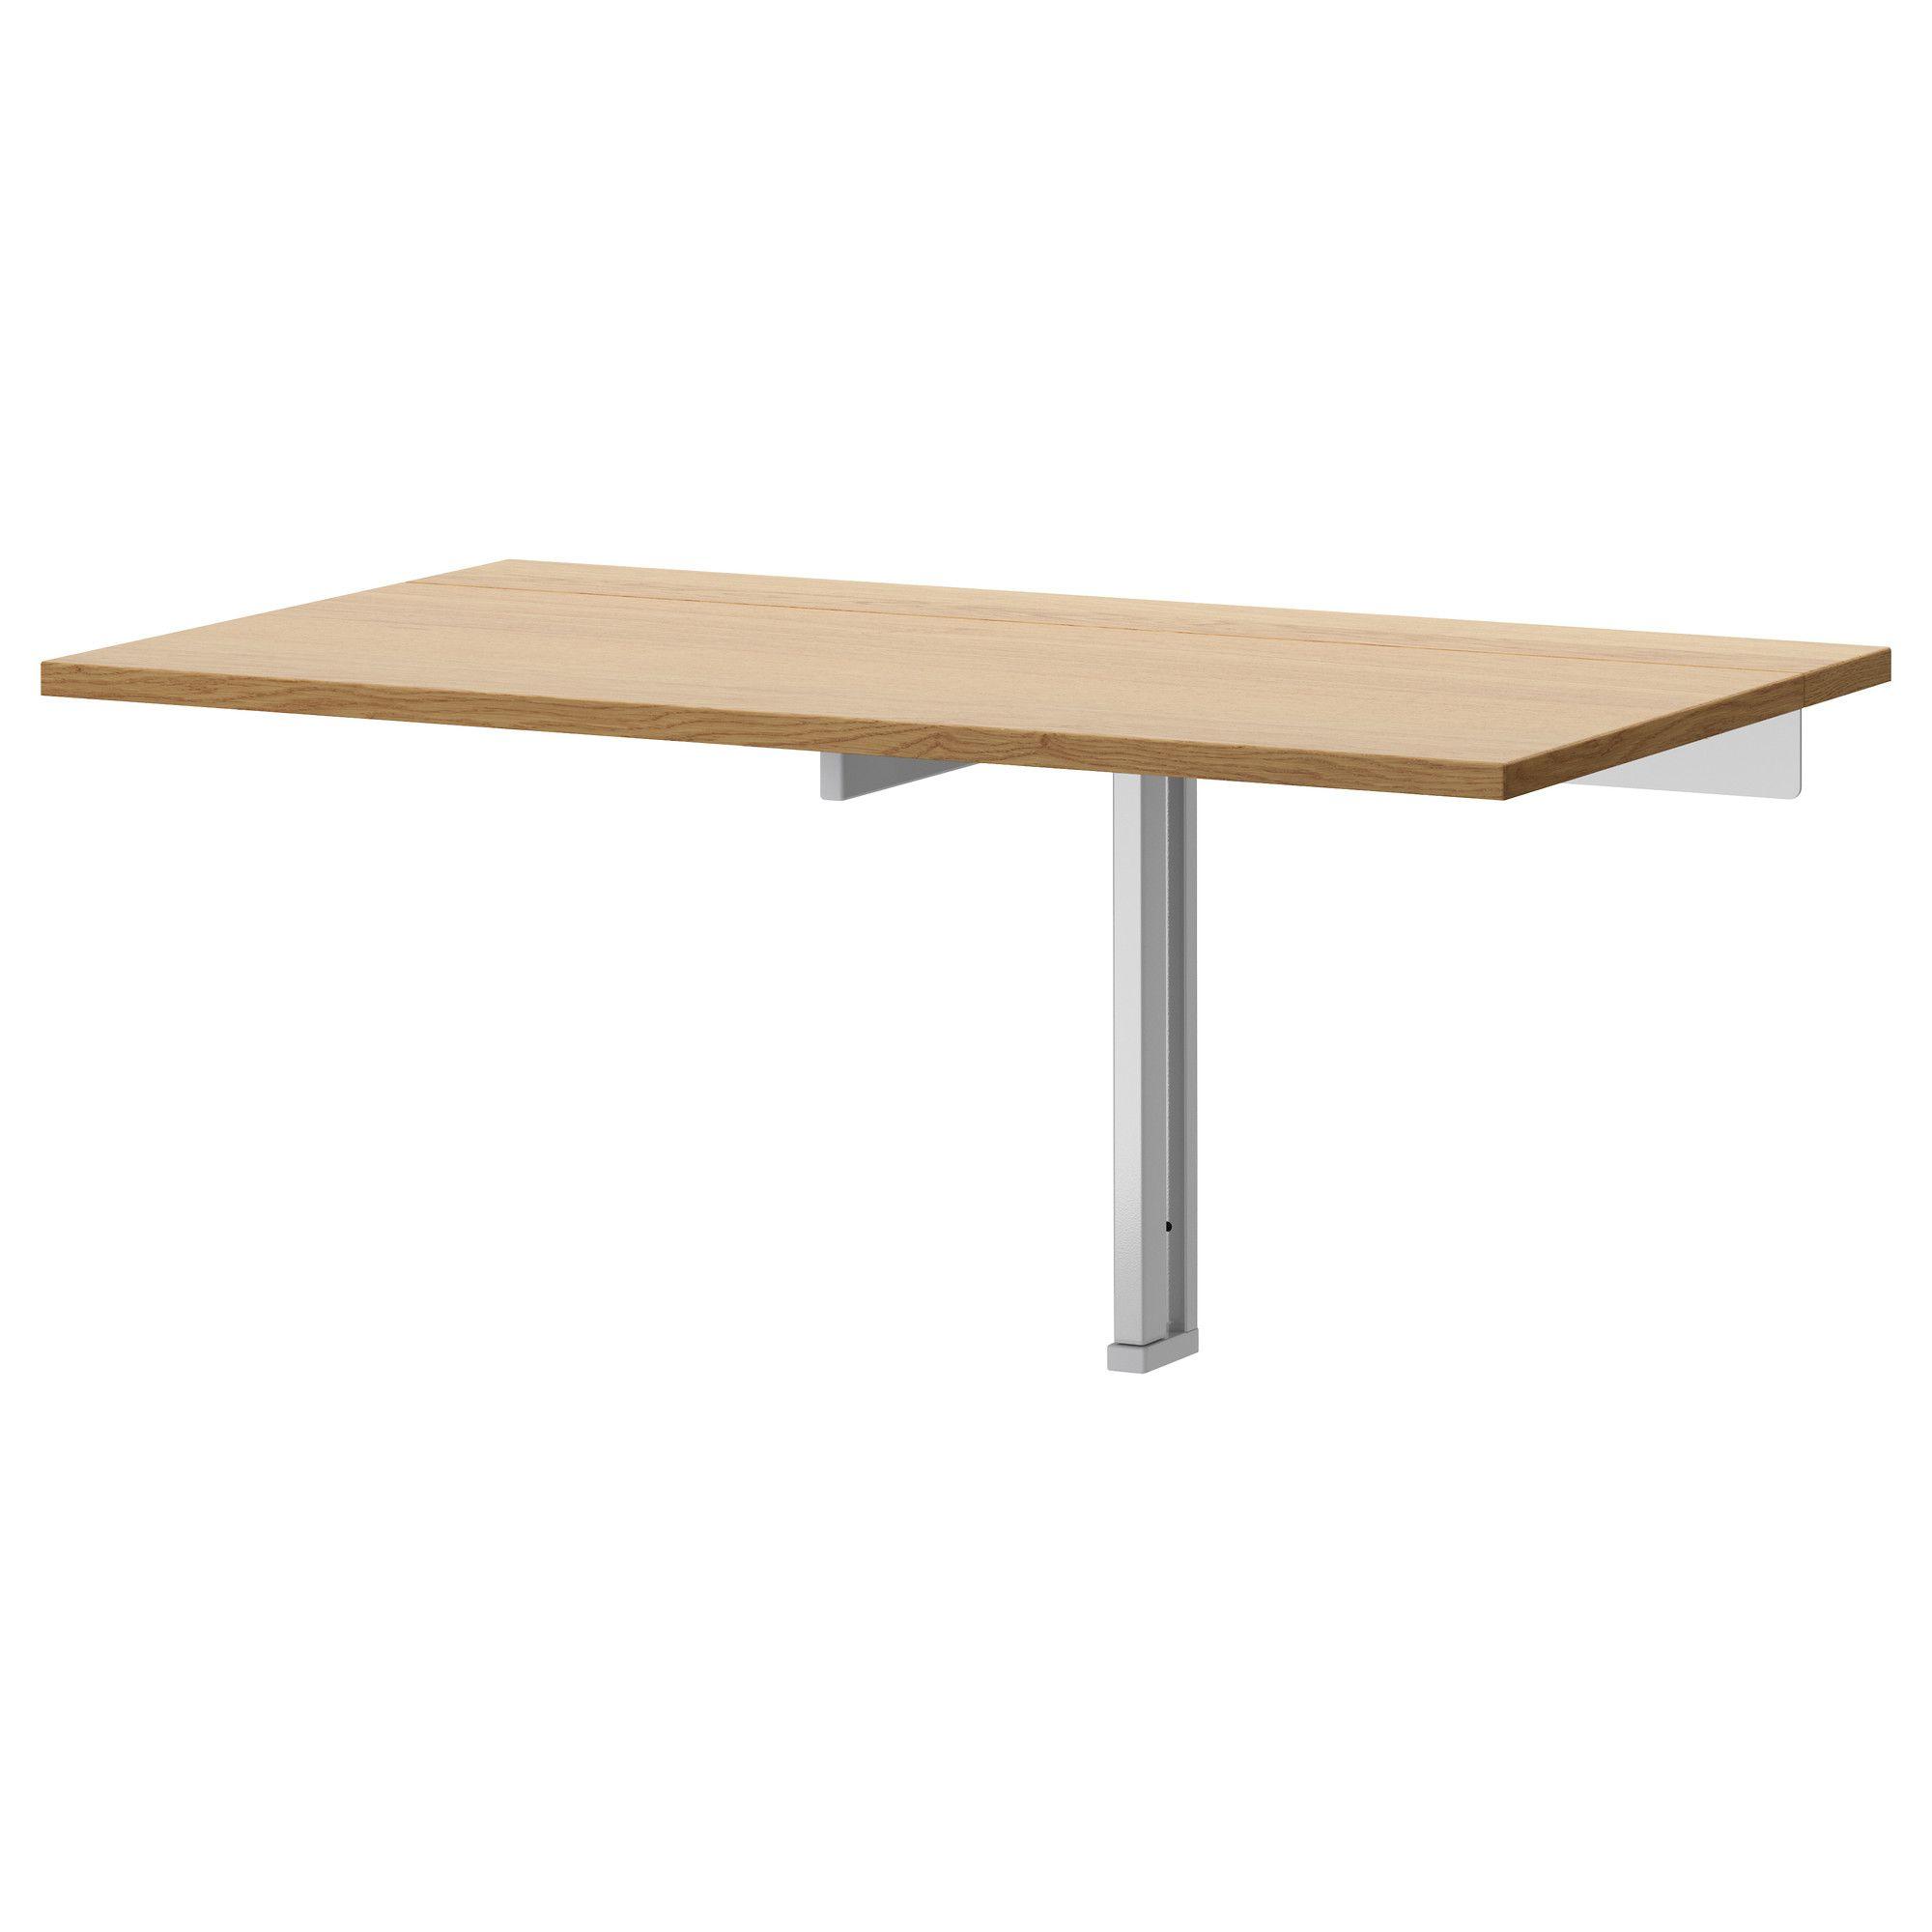 BJURSTA Wall mounted drop leaf table IKEA